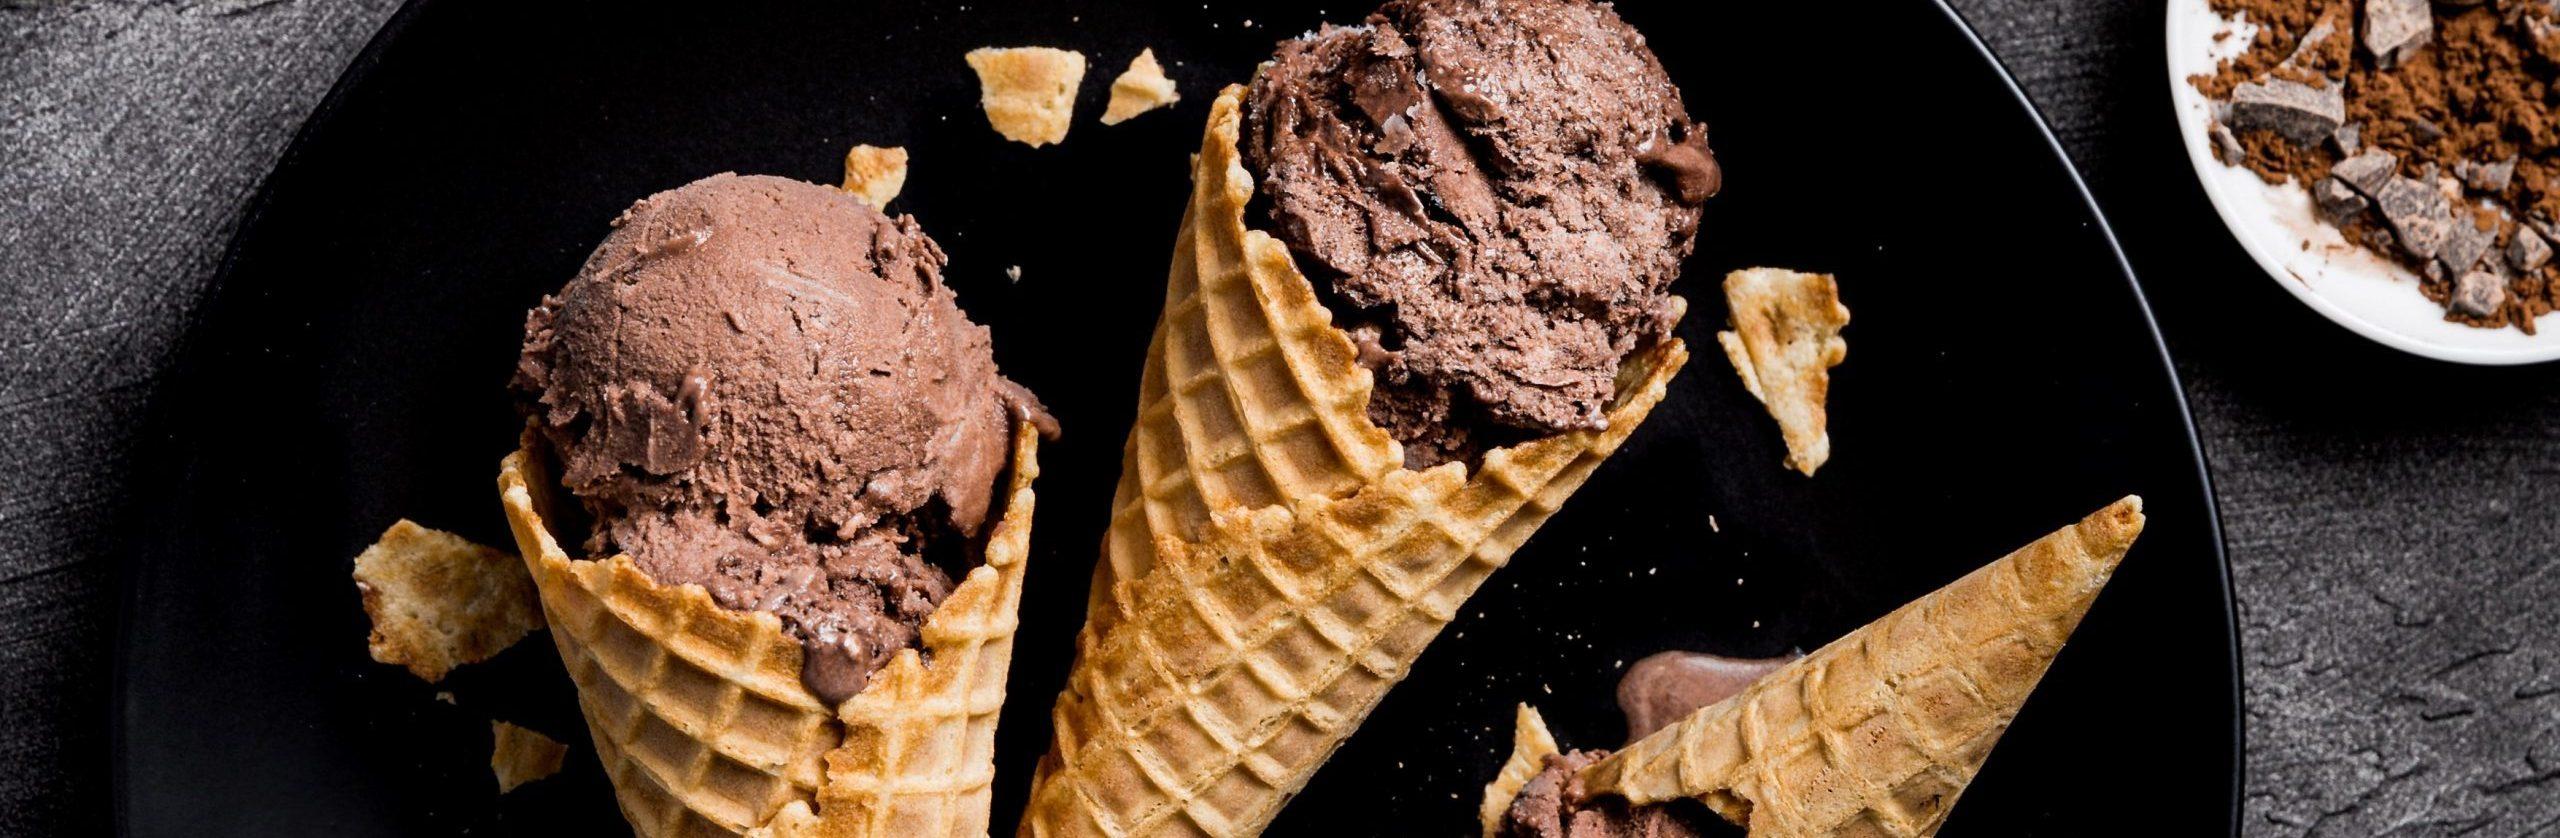 chocolate-coconut-ice-cream